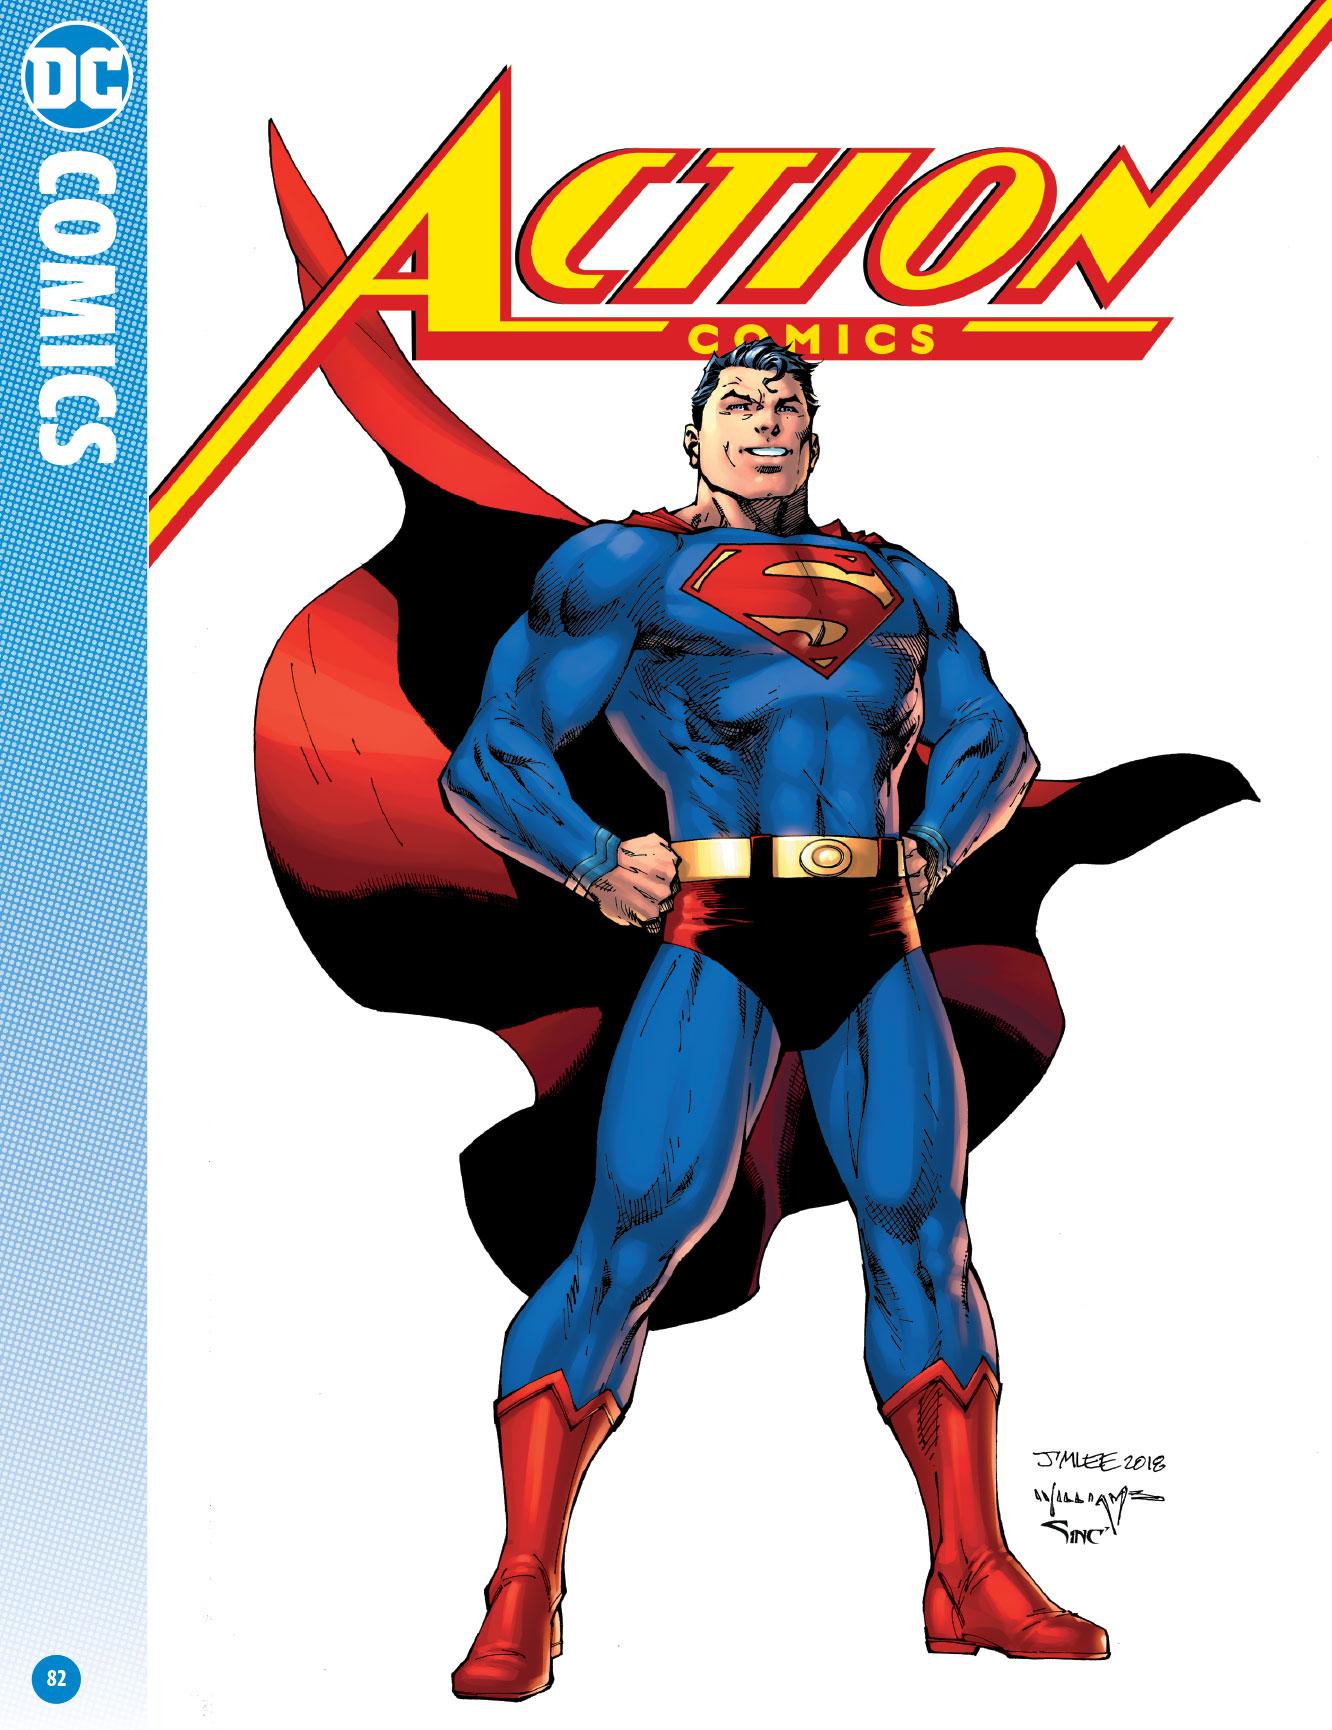 DC Comics April 2018 Catalog - Solicits From Action Comics #1000 to ...